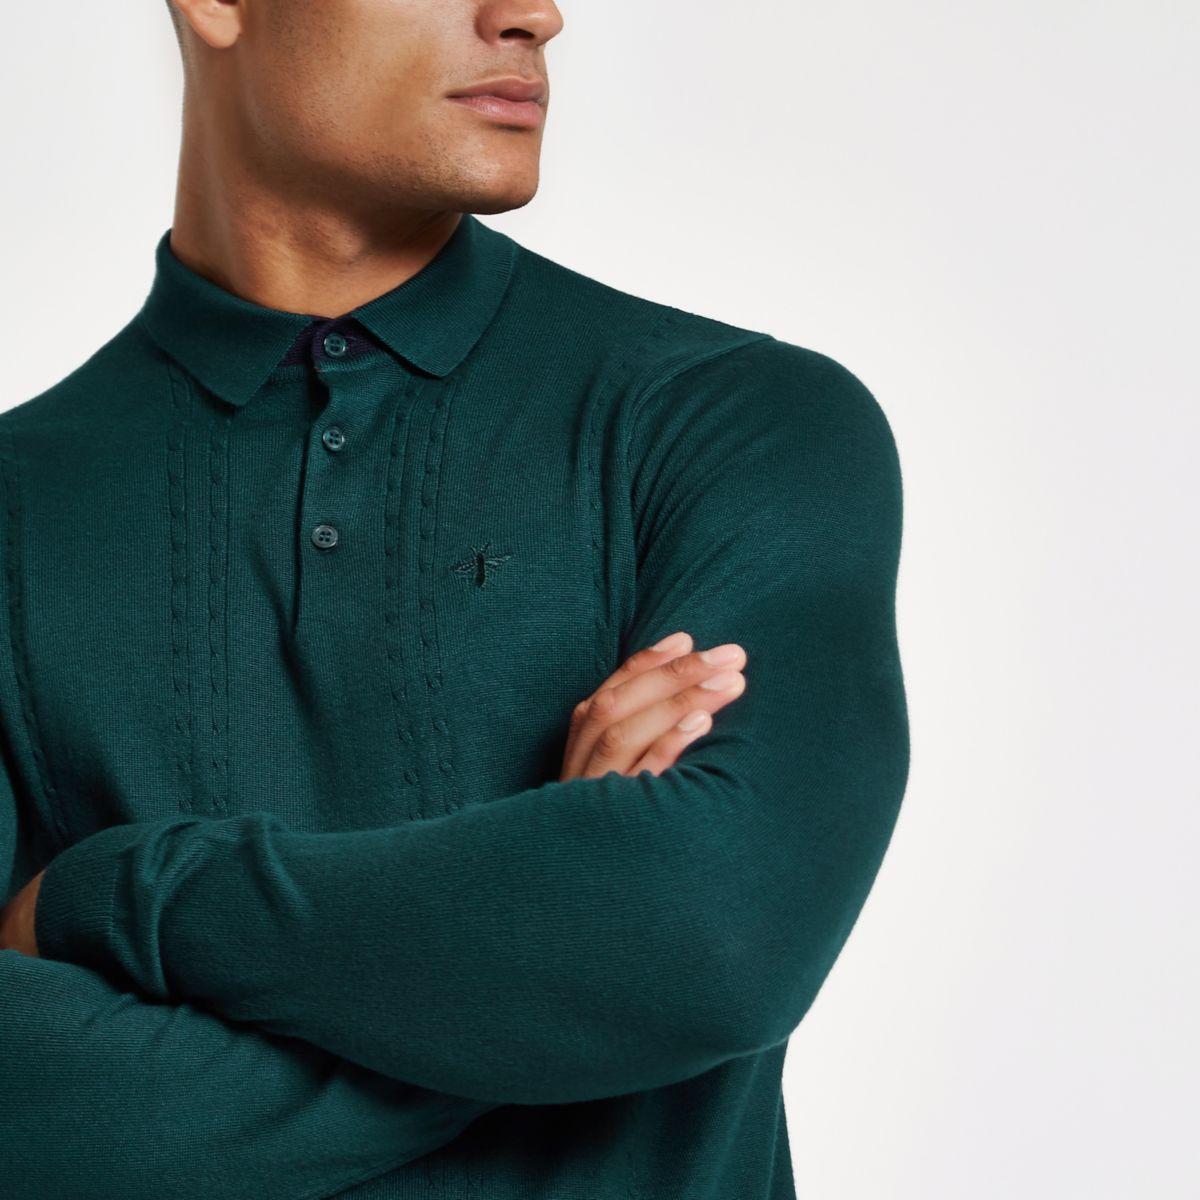 Teal green slim fit long sleeve polo shirt